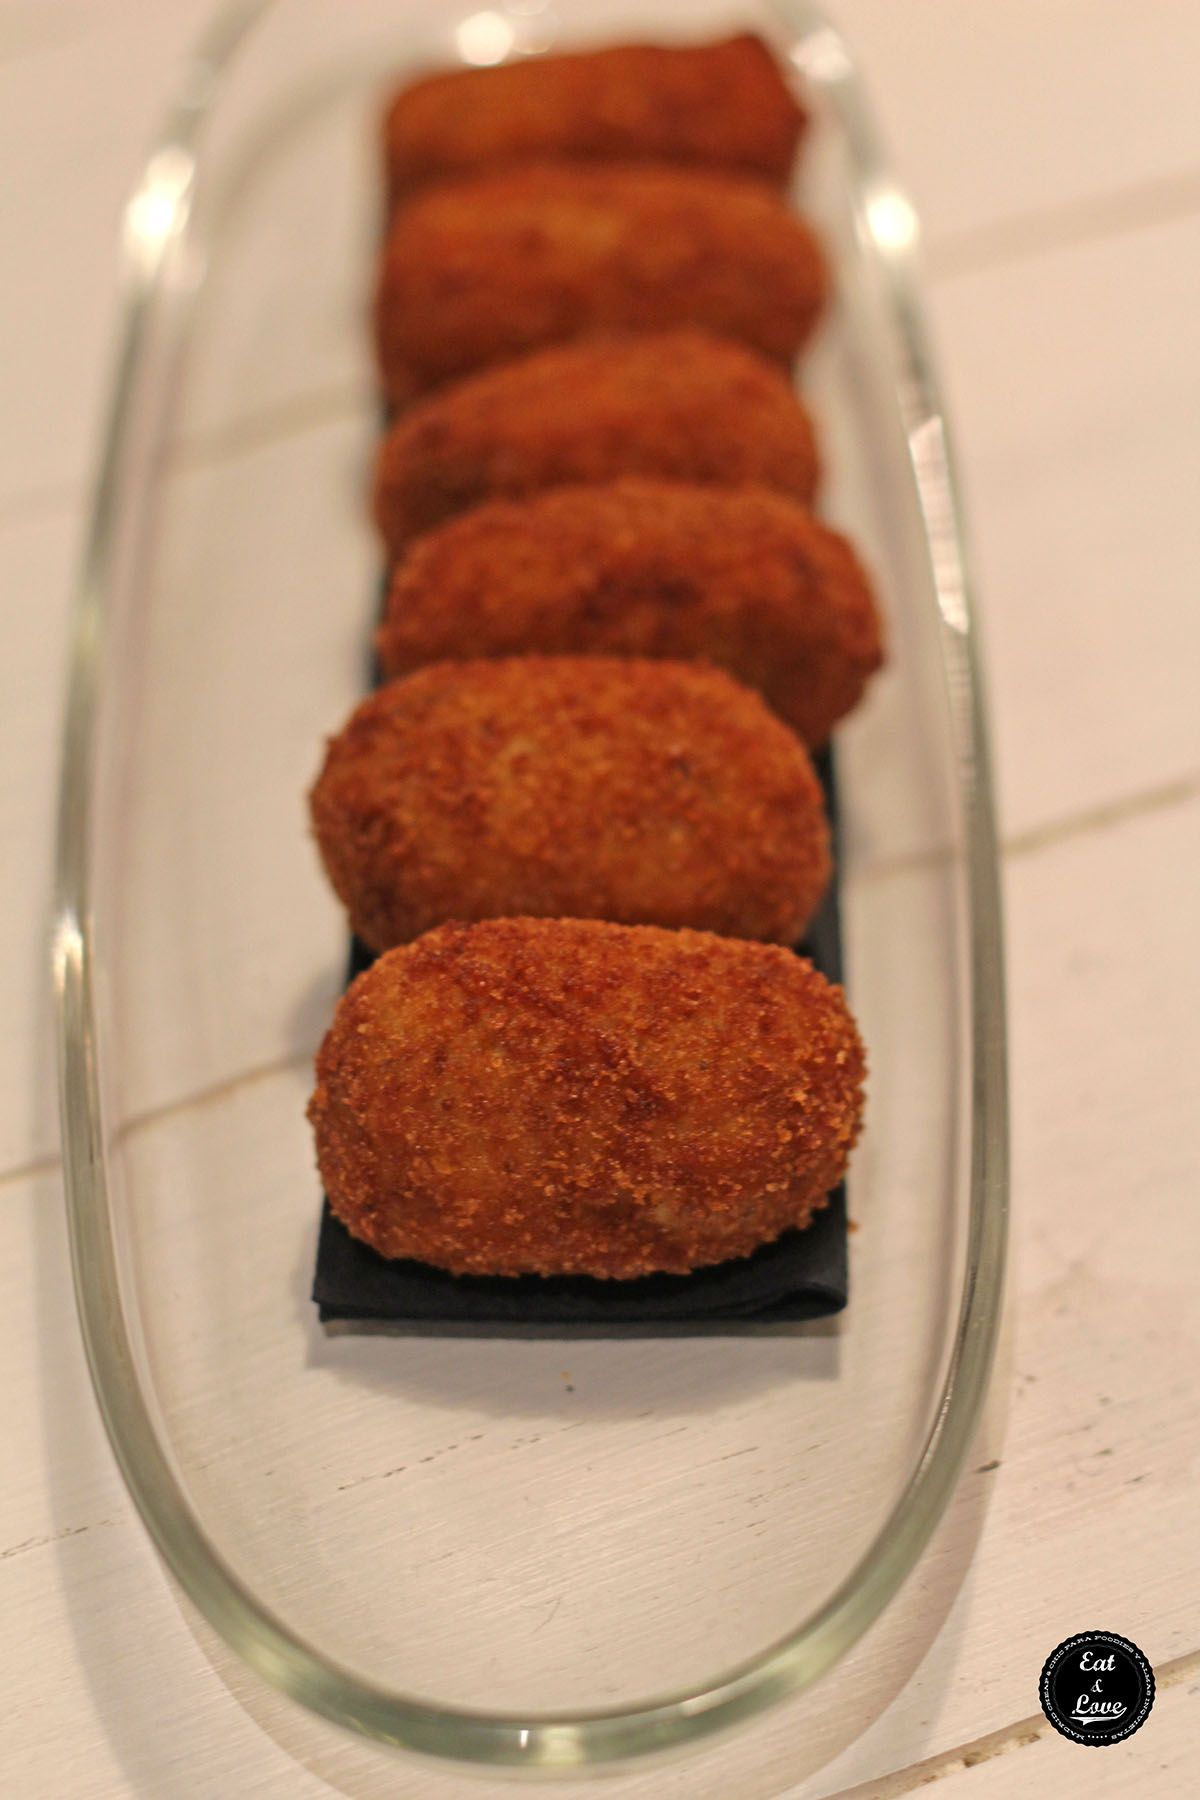 Croquetas de puchero - Bache restaurante - Madrid